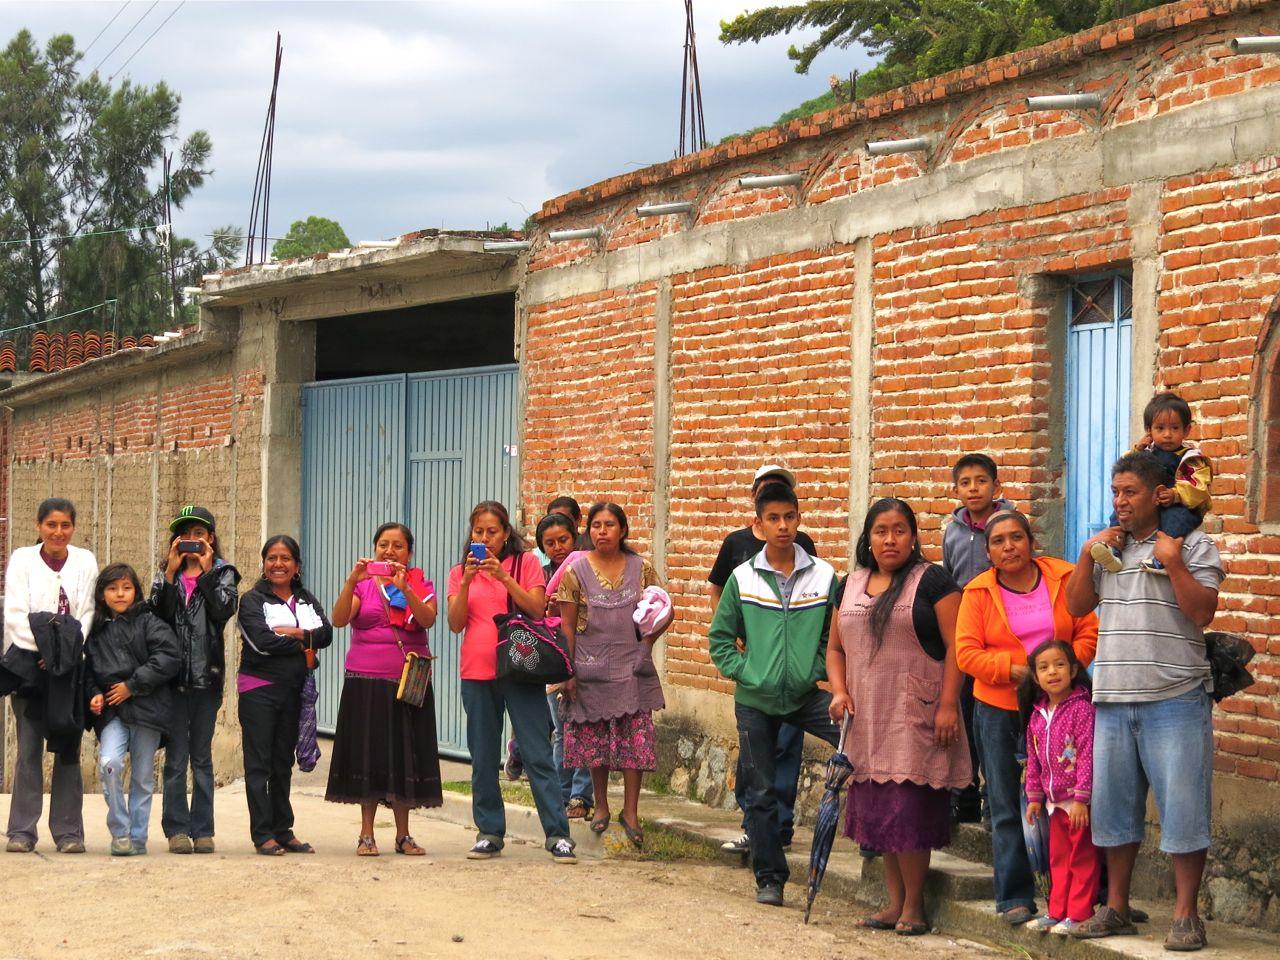 Men, women, and children standing on street